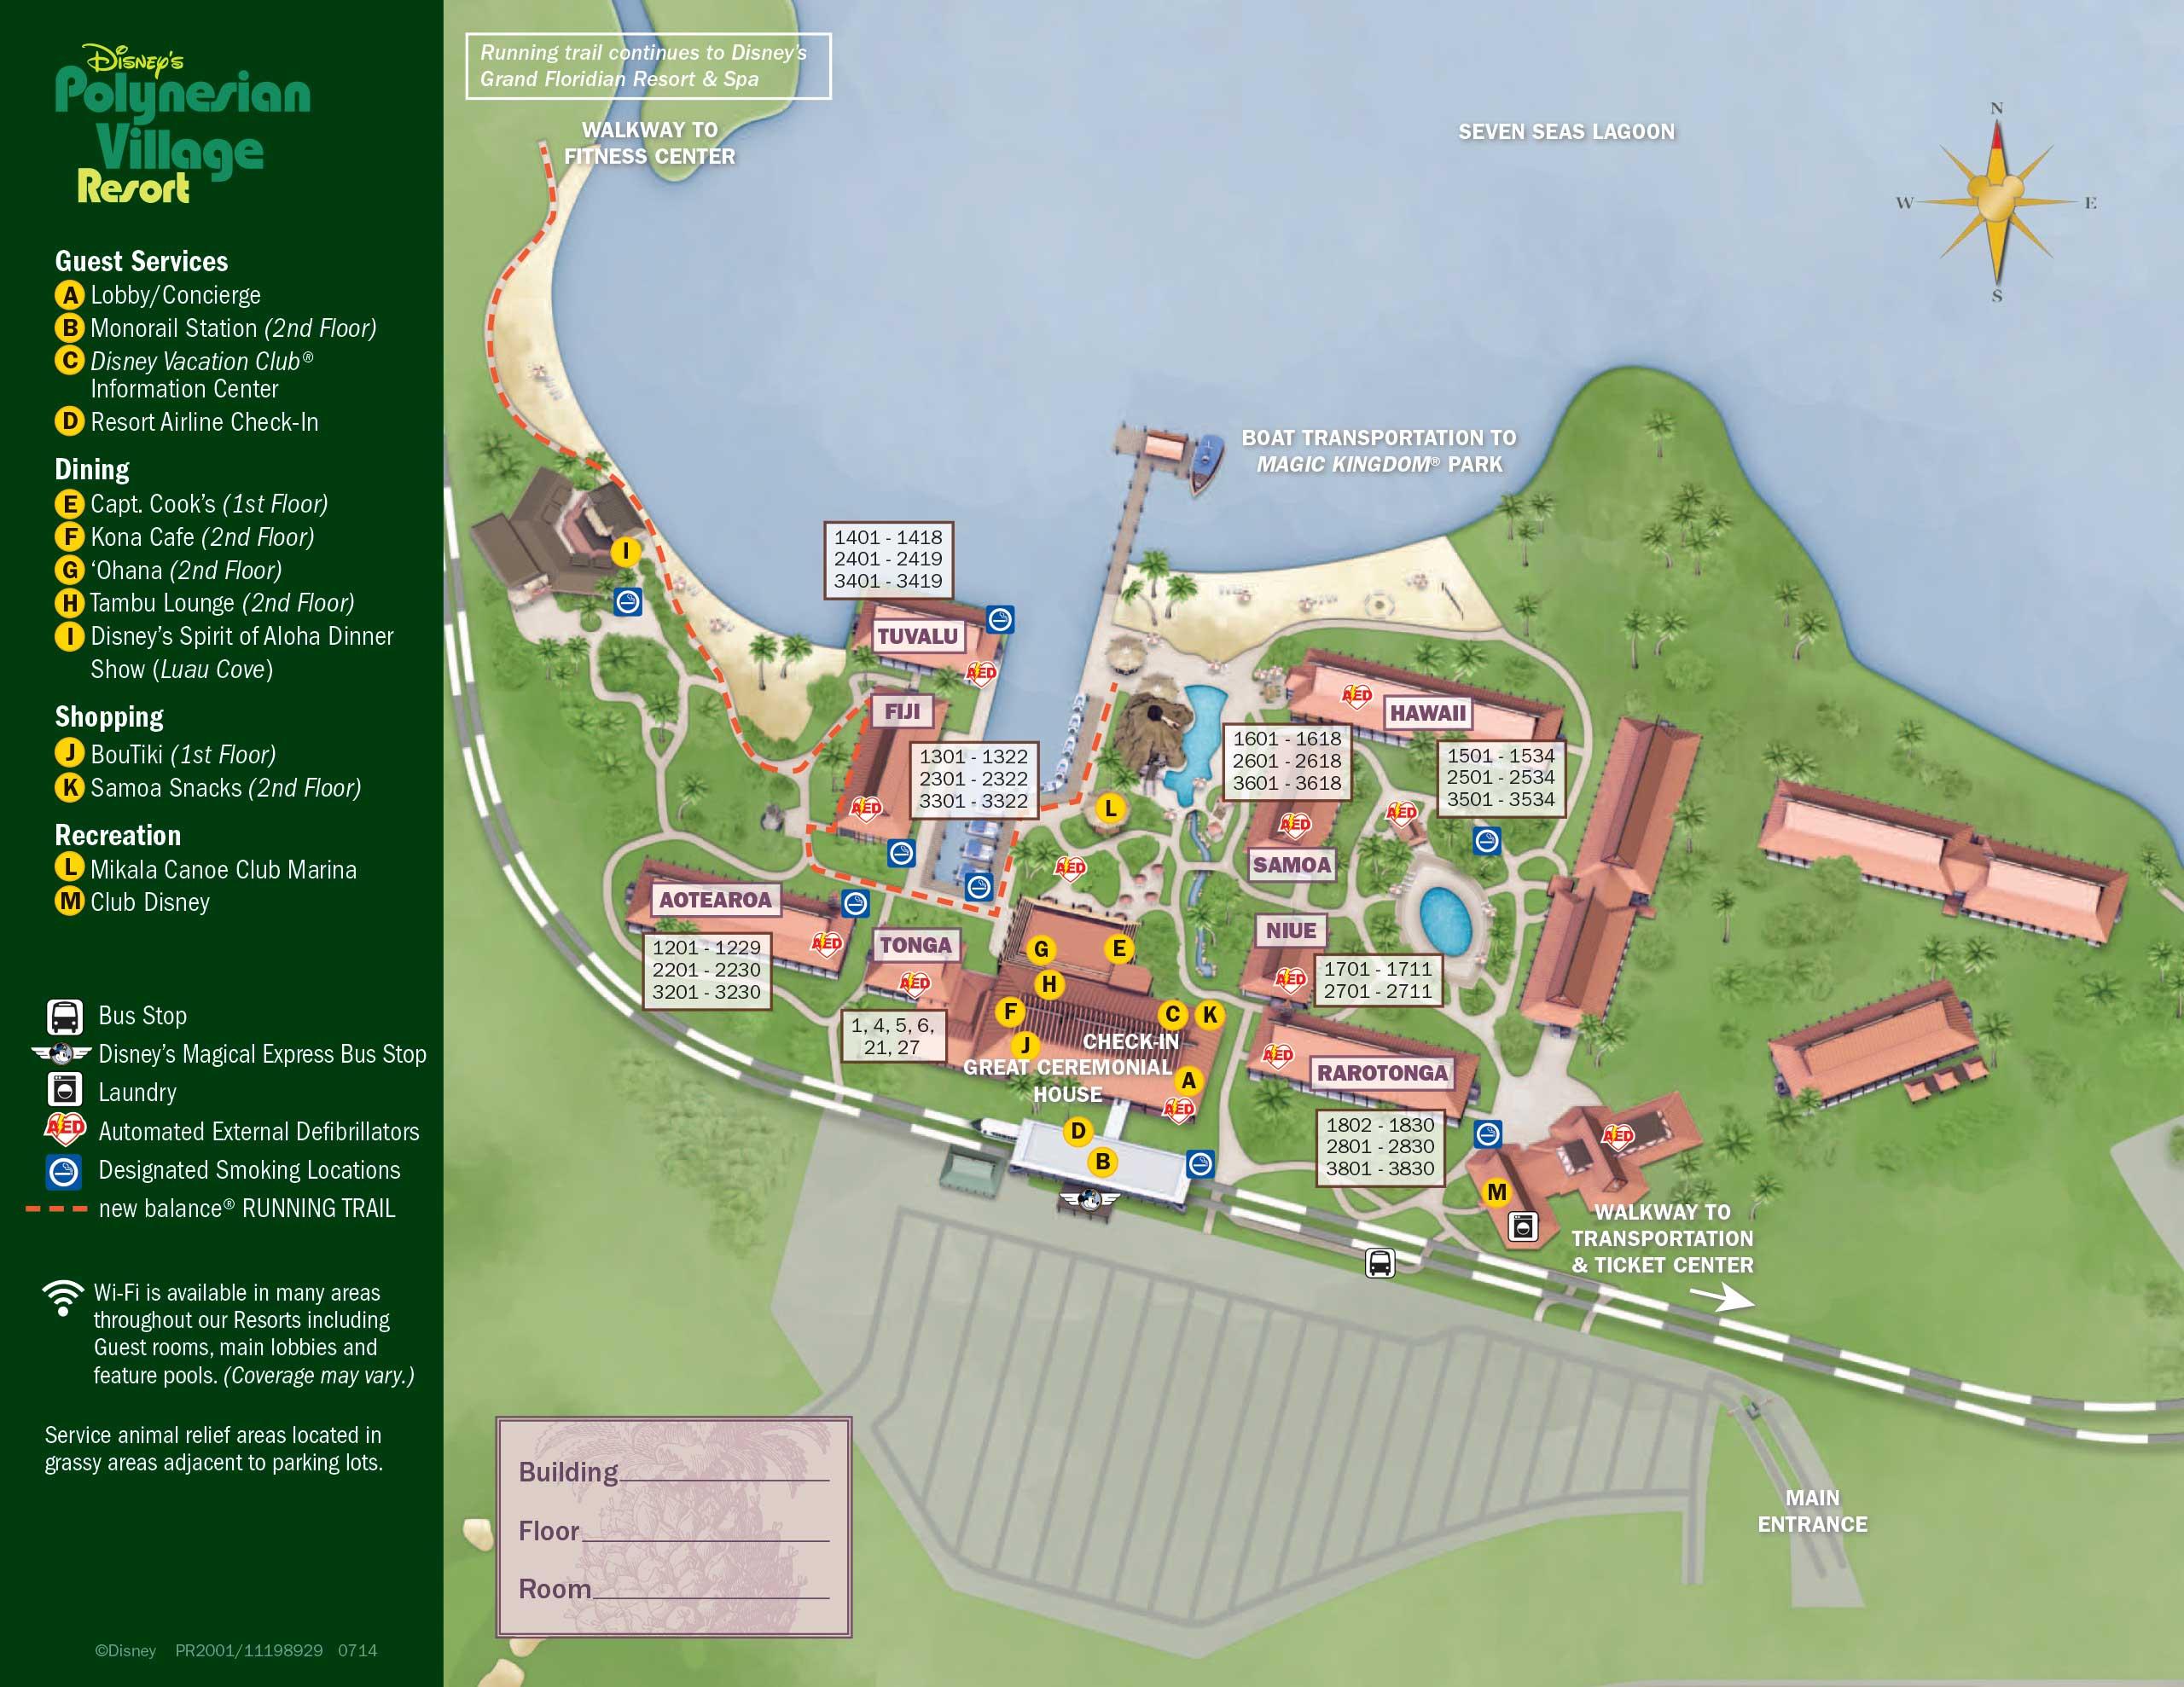 2014 Disney\'s Polynesian Village Resort guide map - Photo 1 of 1